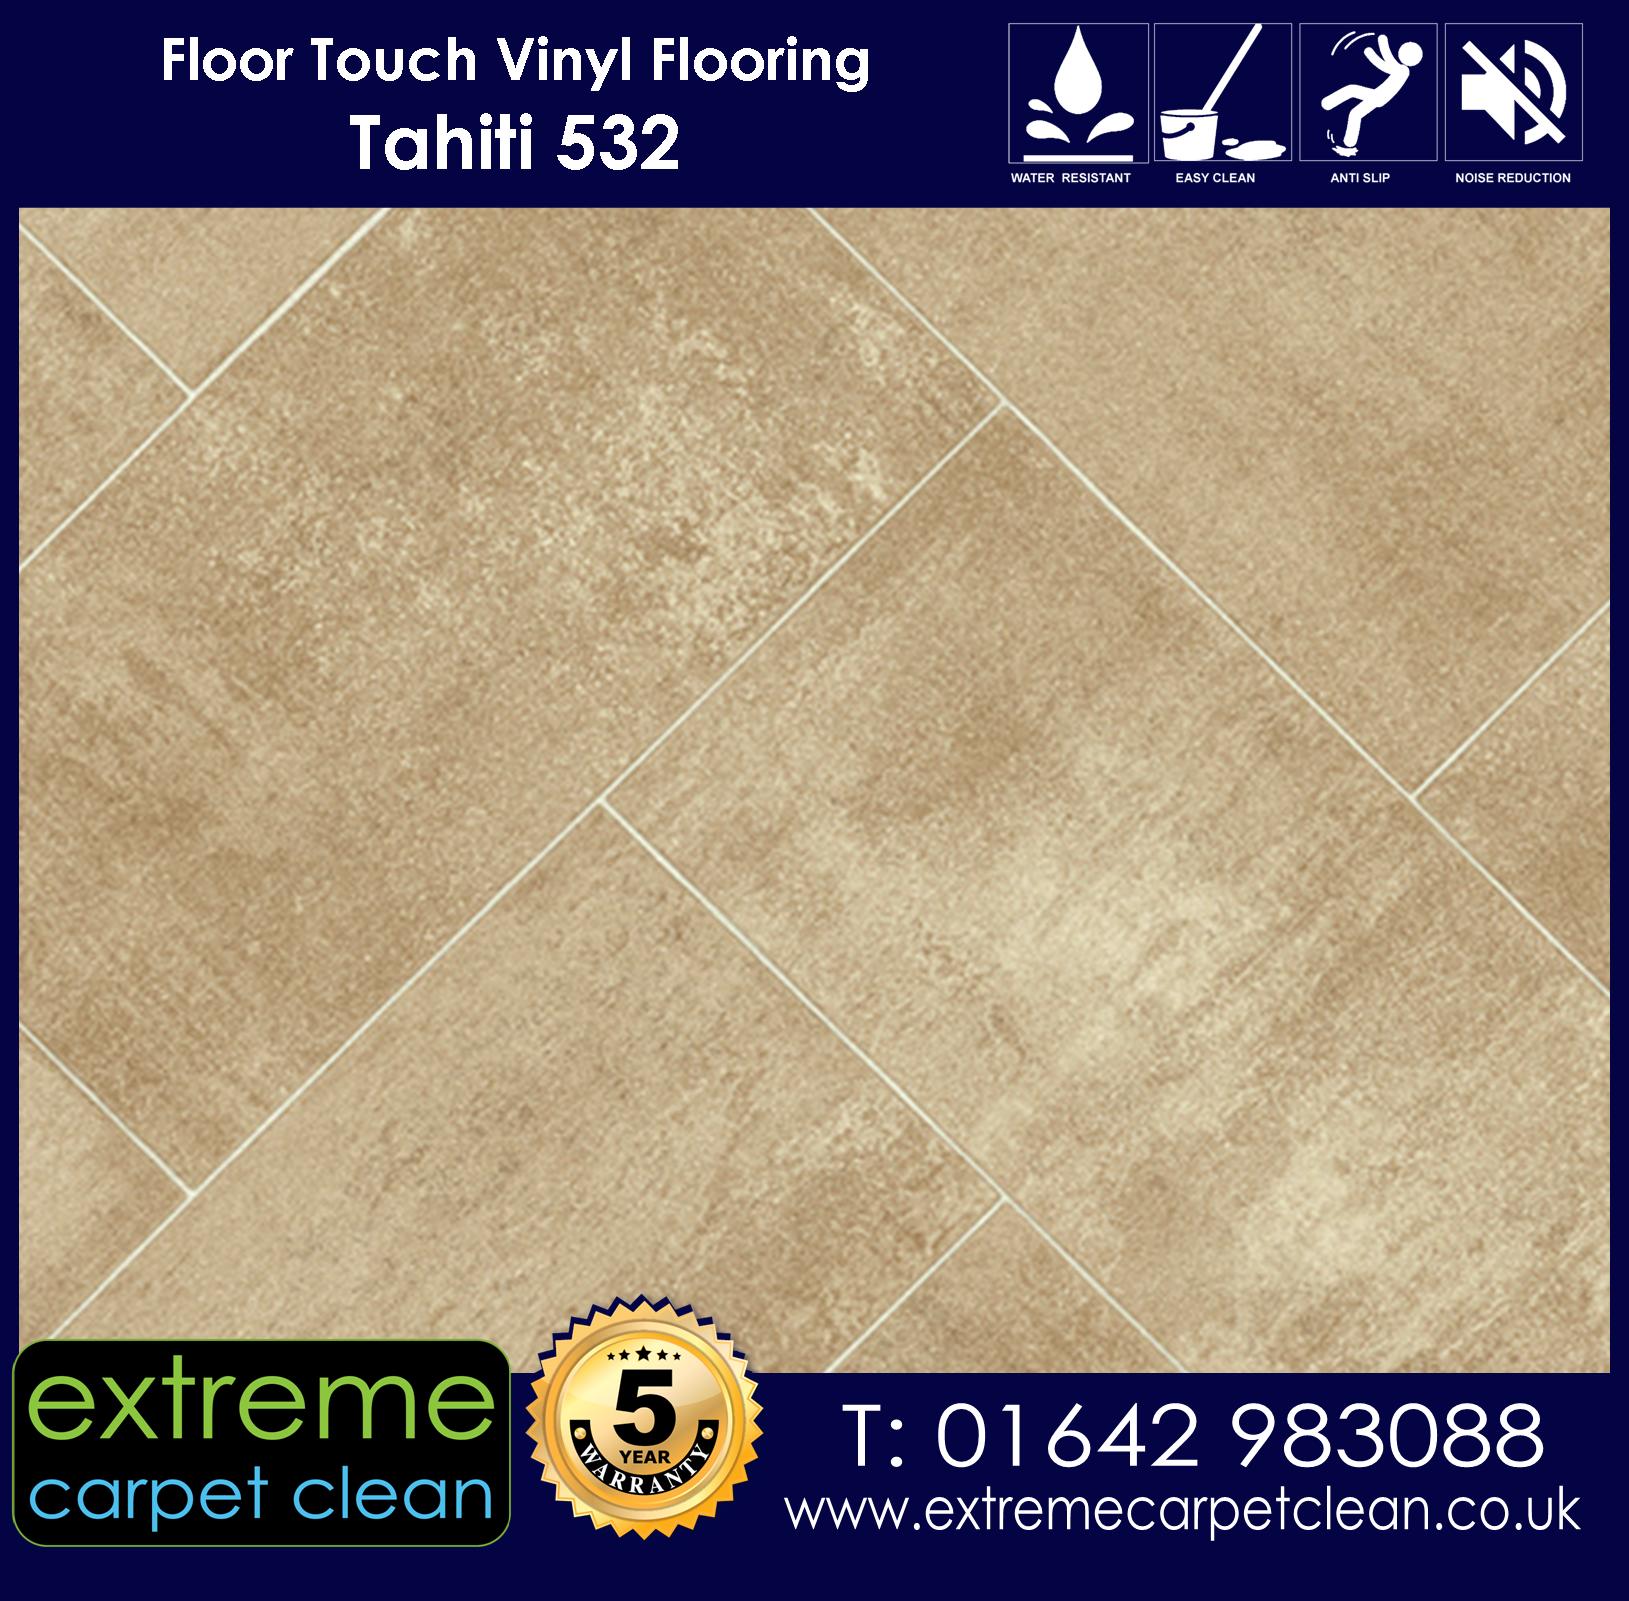 Extreme Carpet Clean. Vinyl Flooring. Tahiti 532